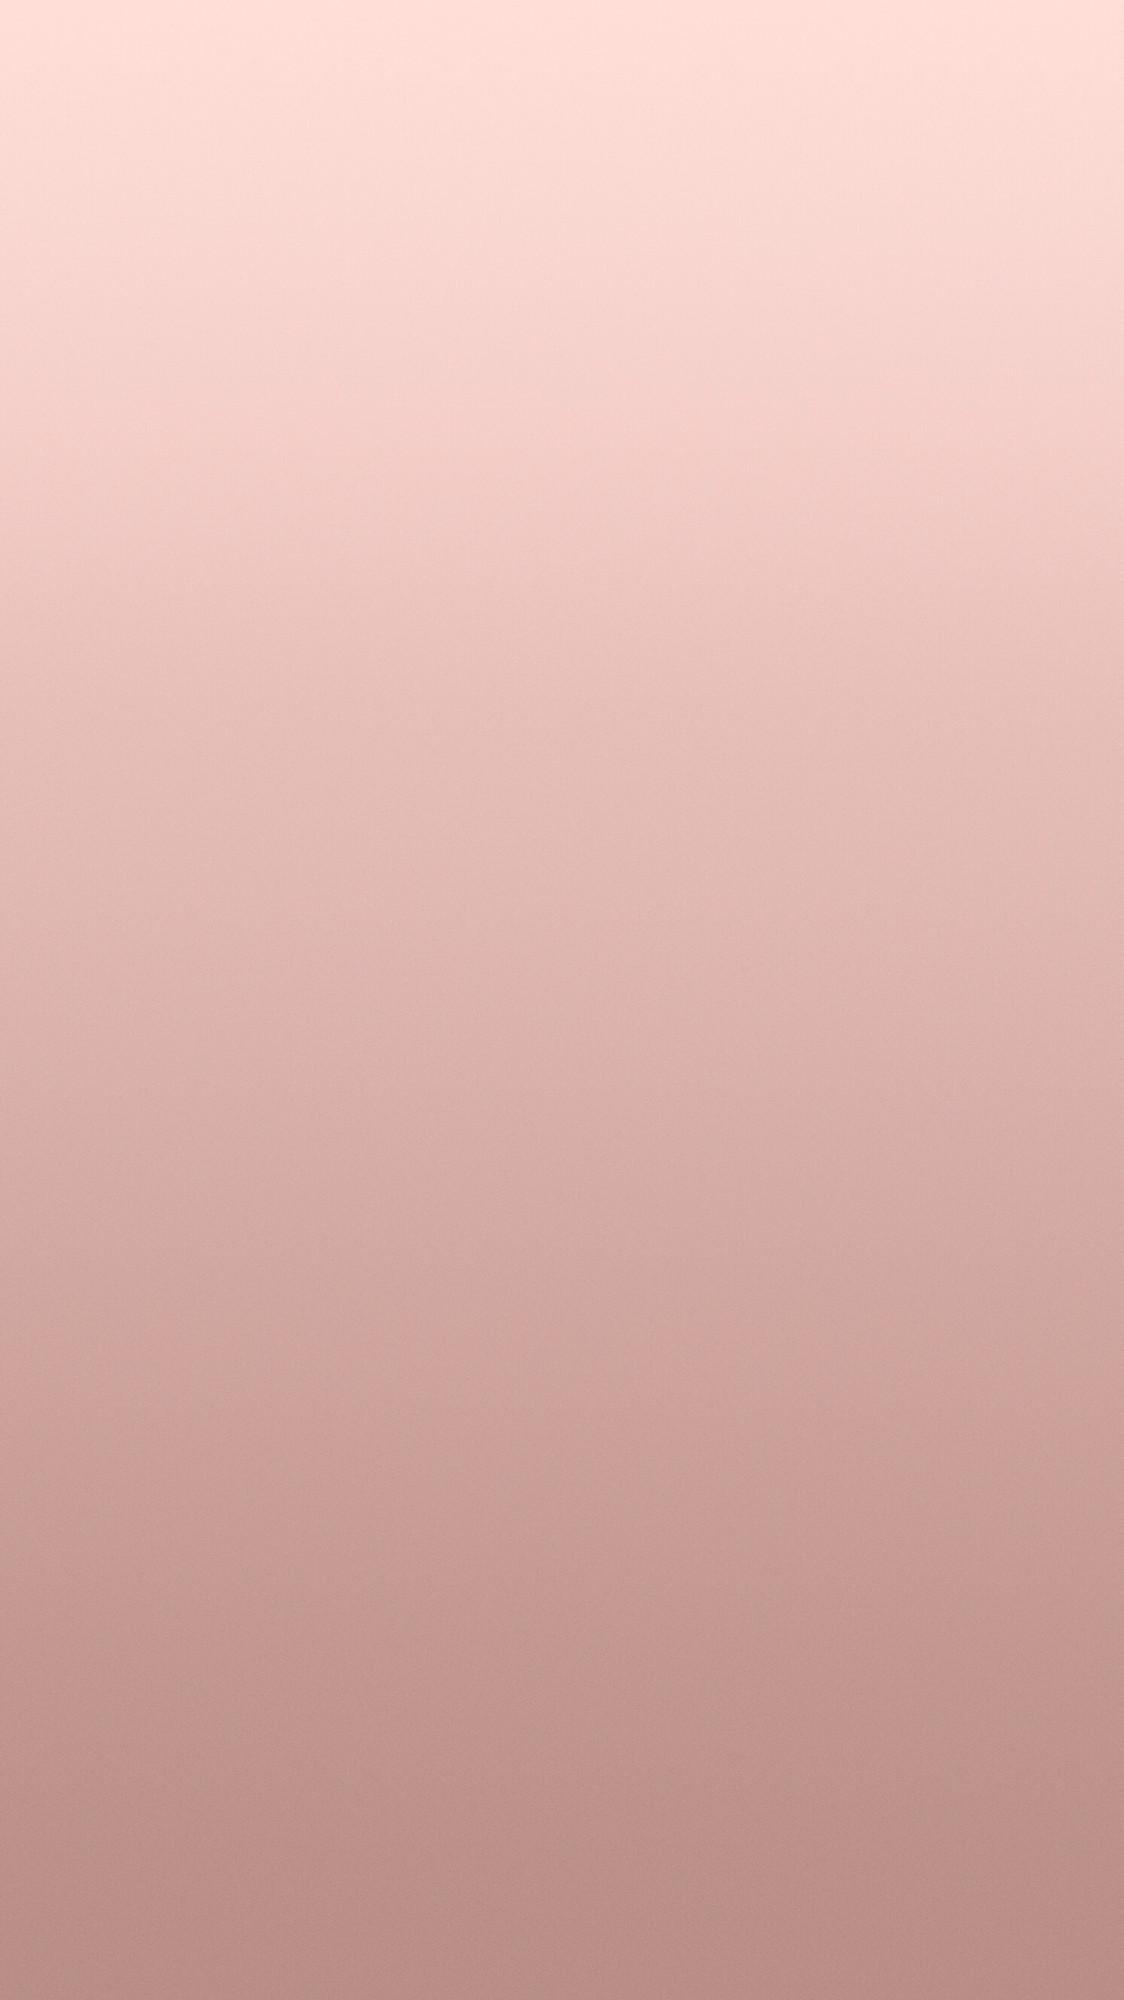 Explore Rose Gold Wallpaper, Iphone Wallpaper, and more!